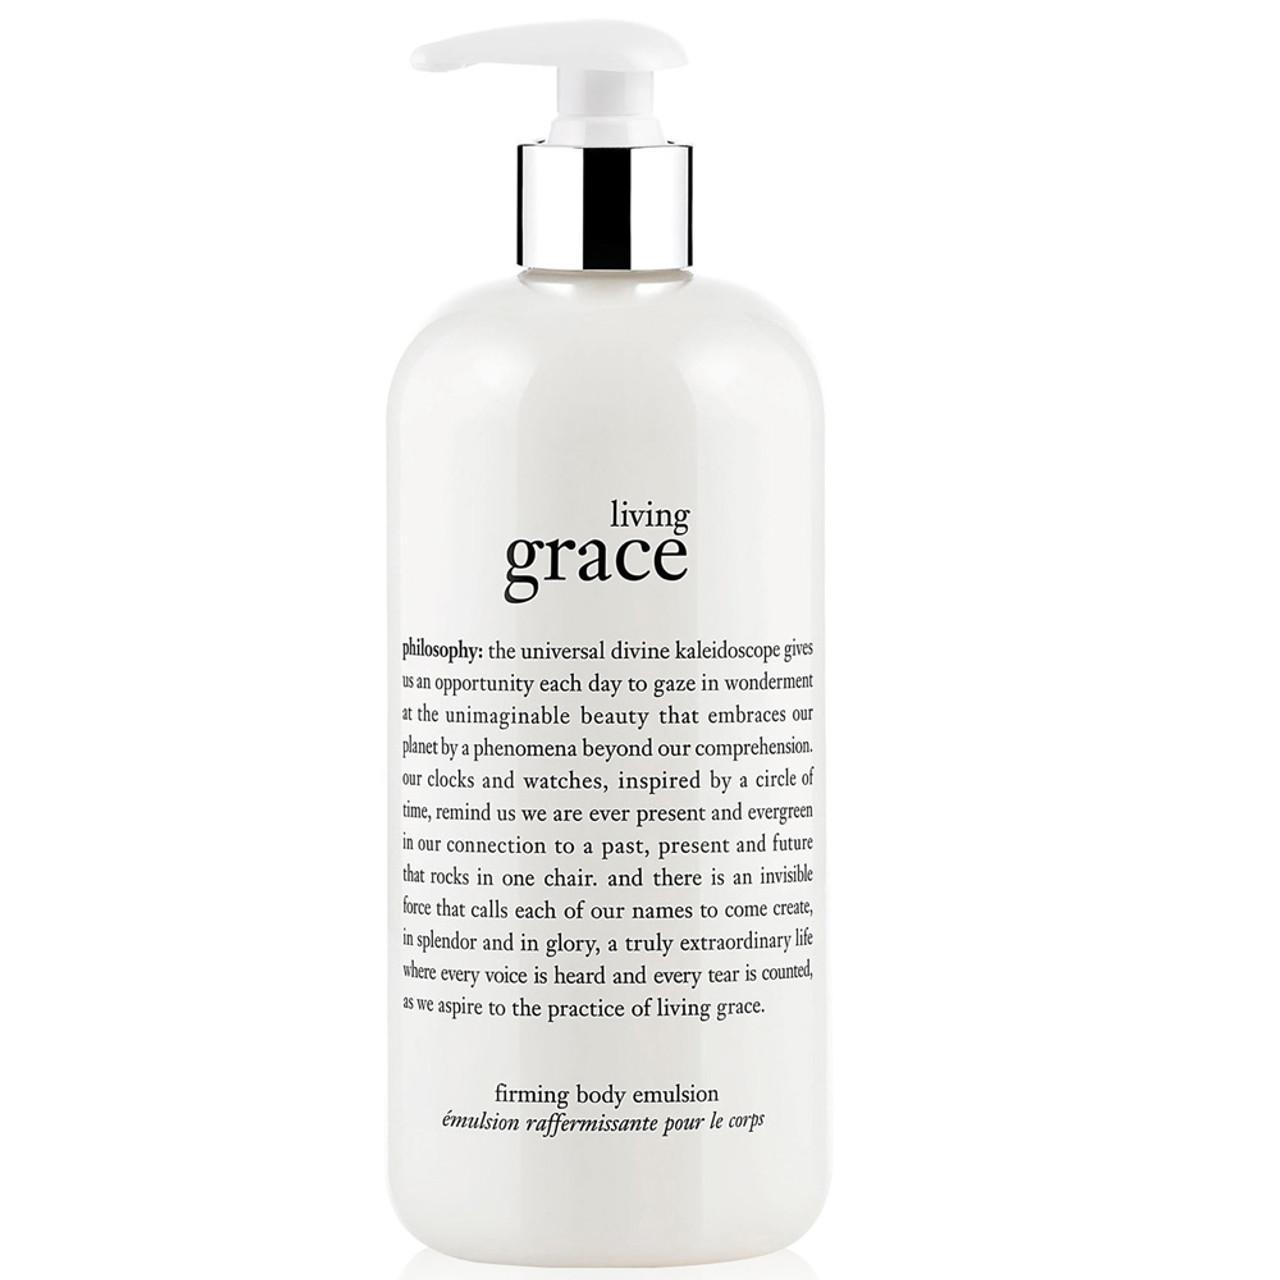 philosophy Living Grace Firming Body Emulsion